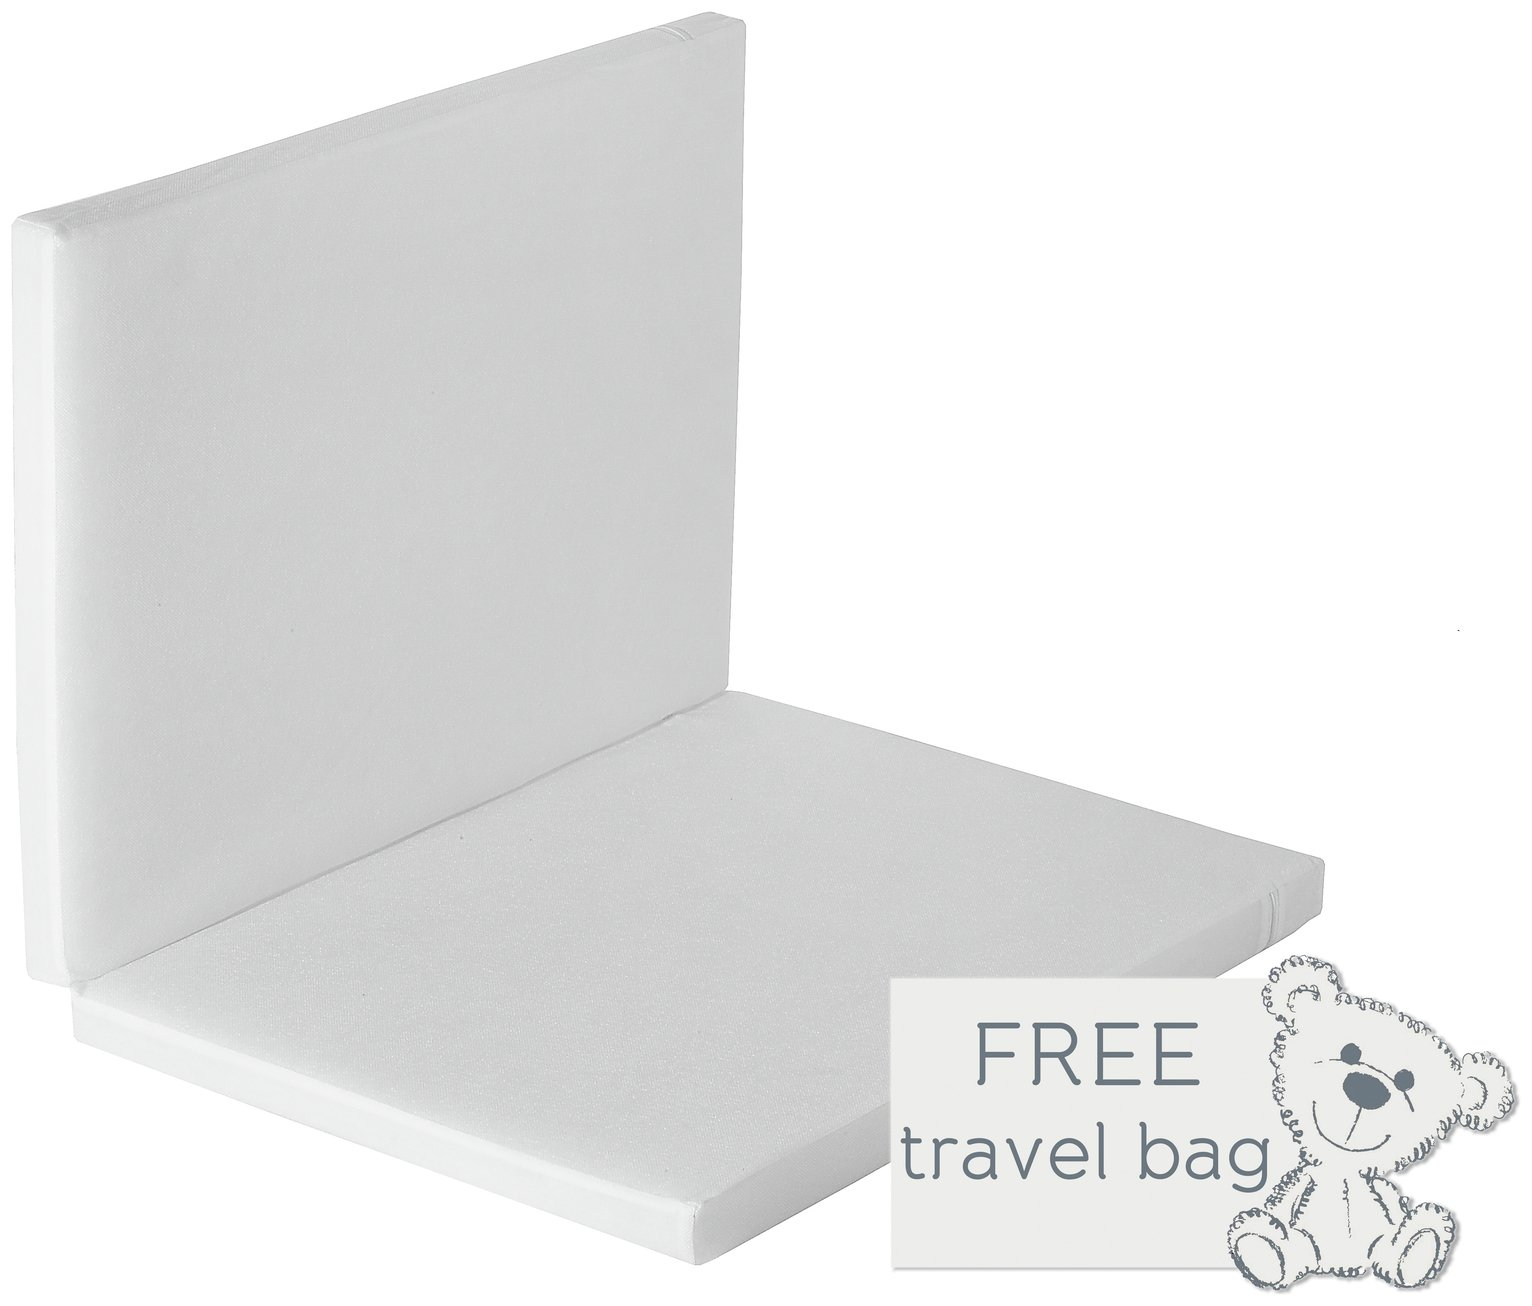 Baby Elegance Foldable Travel Cot Mattress - 66 x 94 cm.